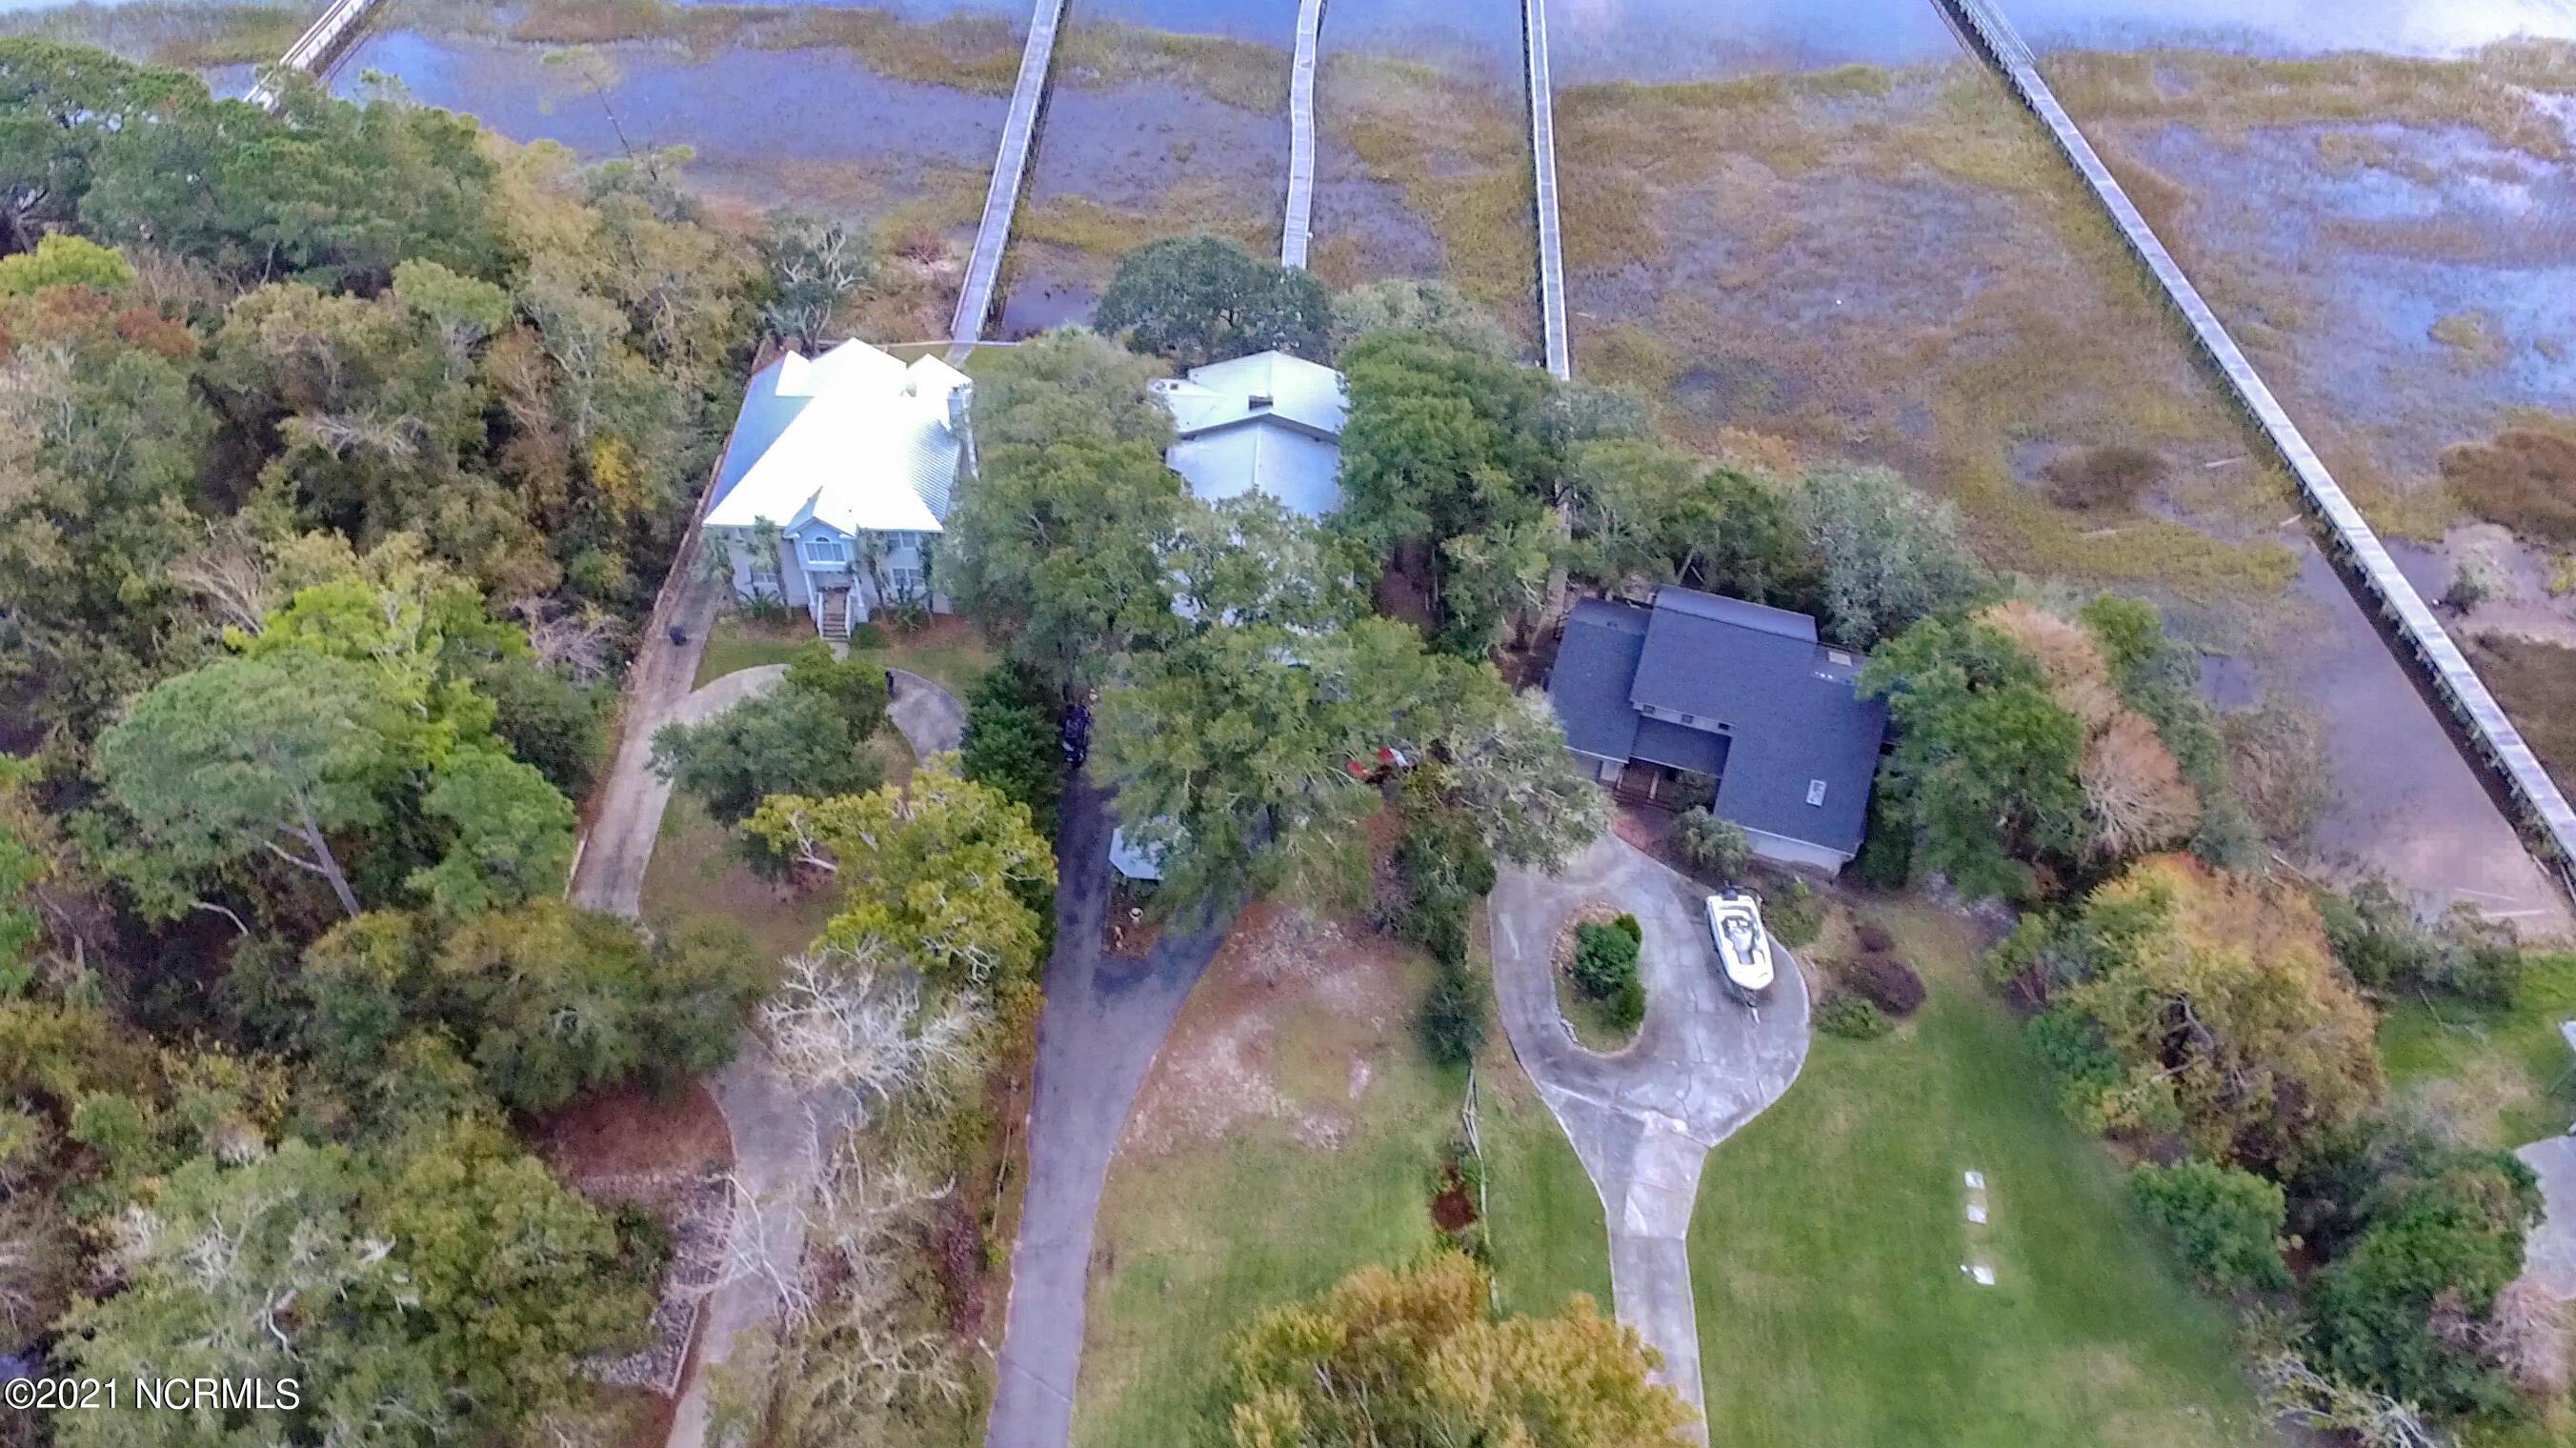 9115 Schuyler Drive, Calabash, North Carolina 28467, 3 Bedrooms Bedrooms, 6 Rooms Rooms,3 BathroomsBathrooms,Single family residence,For sale,Schuyler,100261085